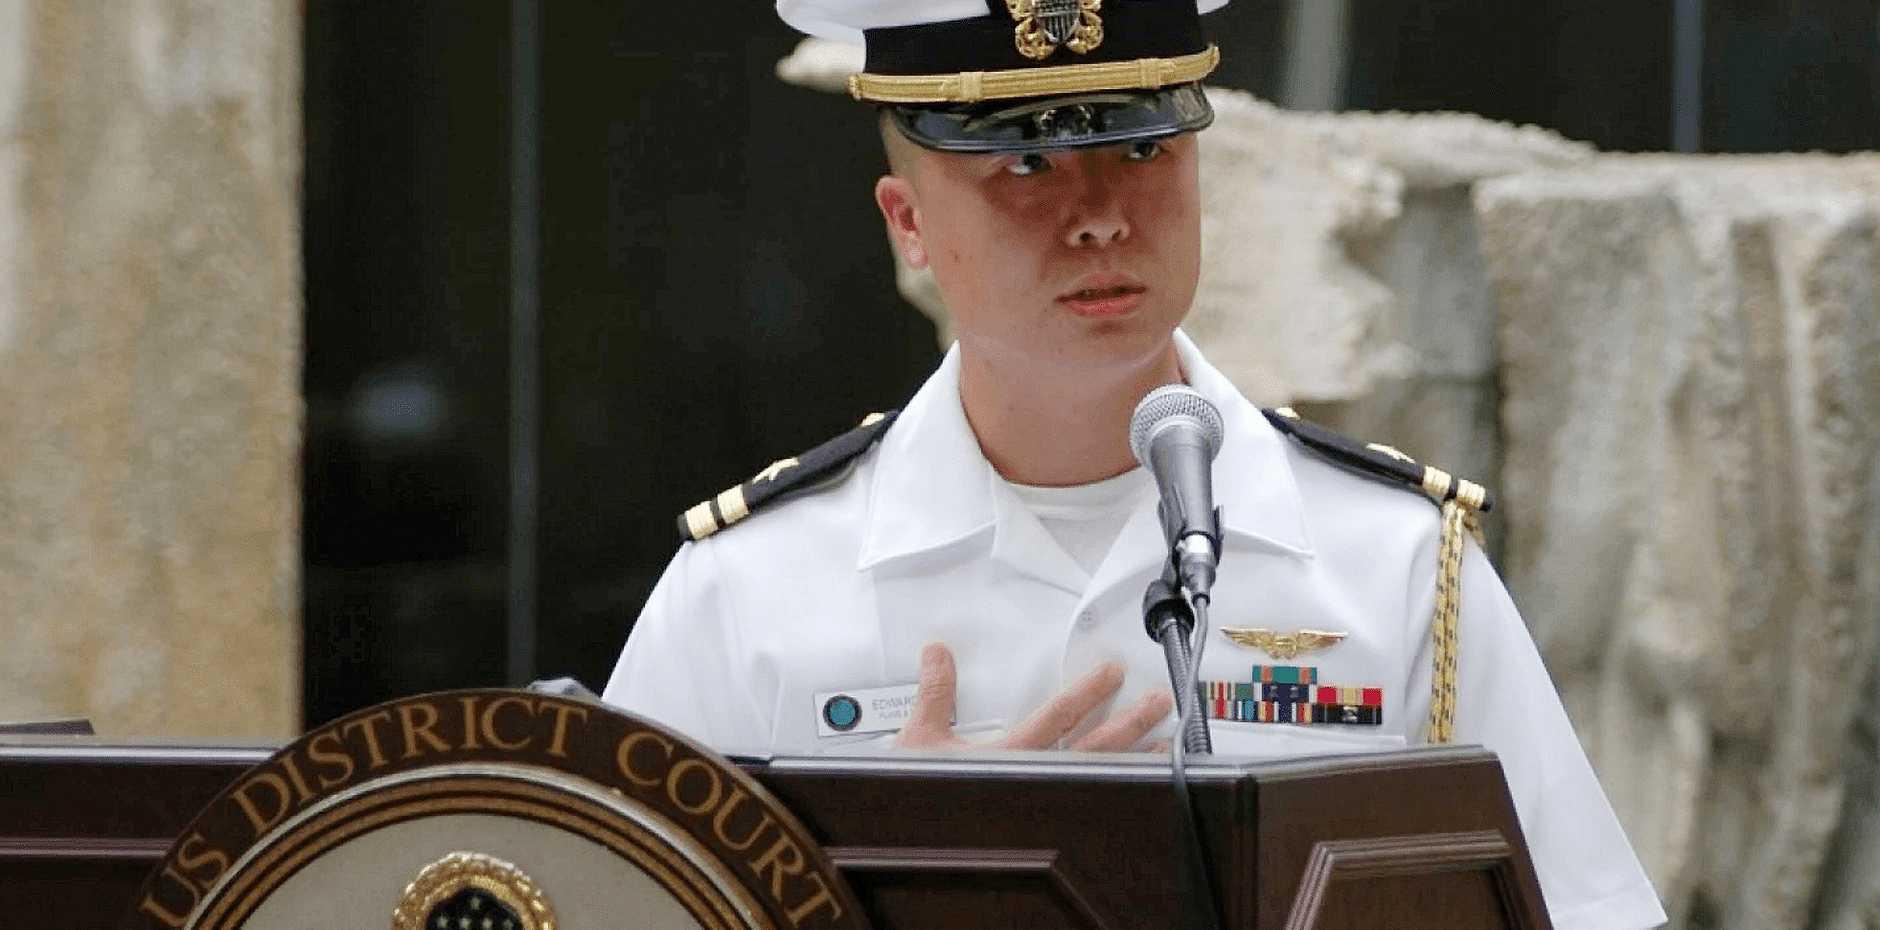 Lt Cdr Edward Lin.